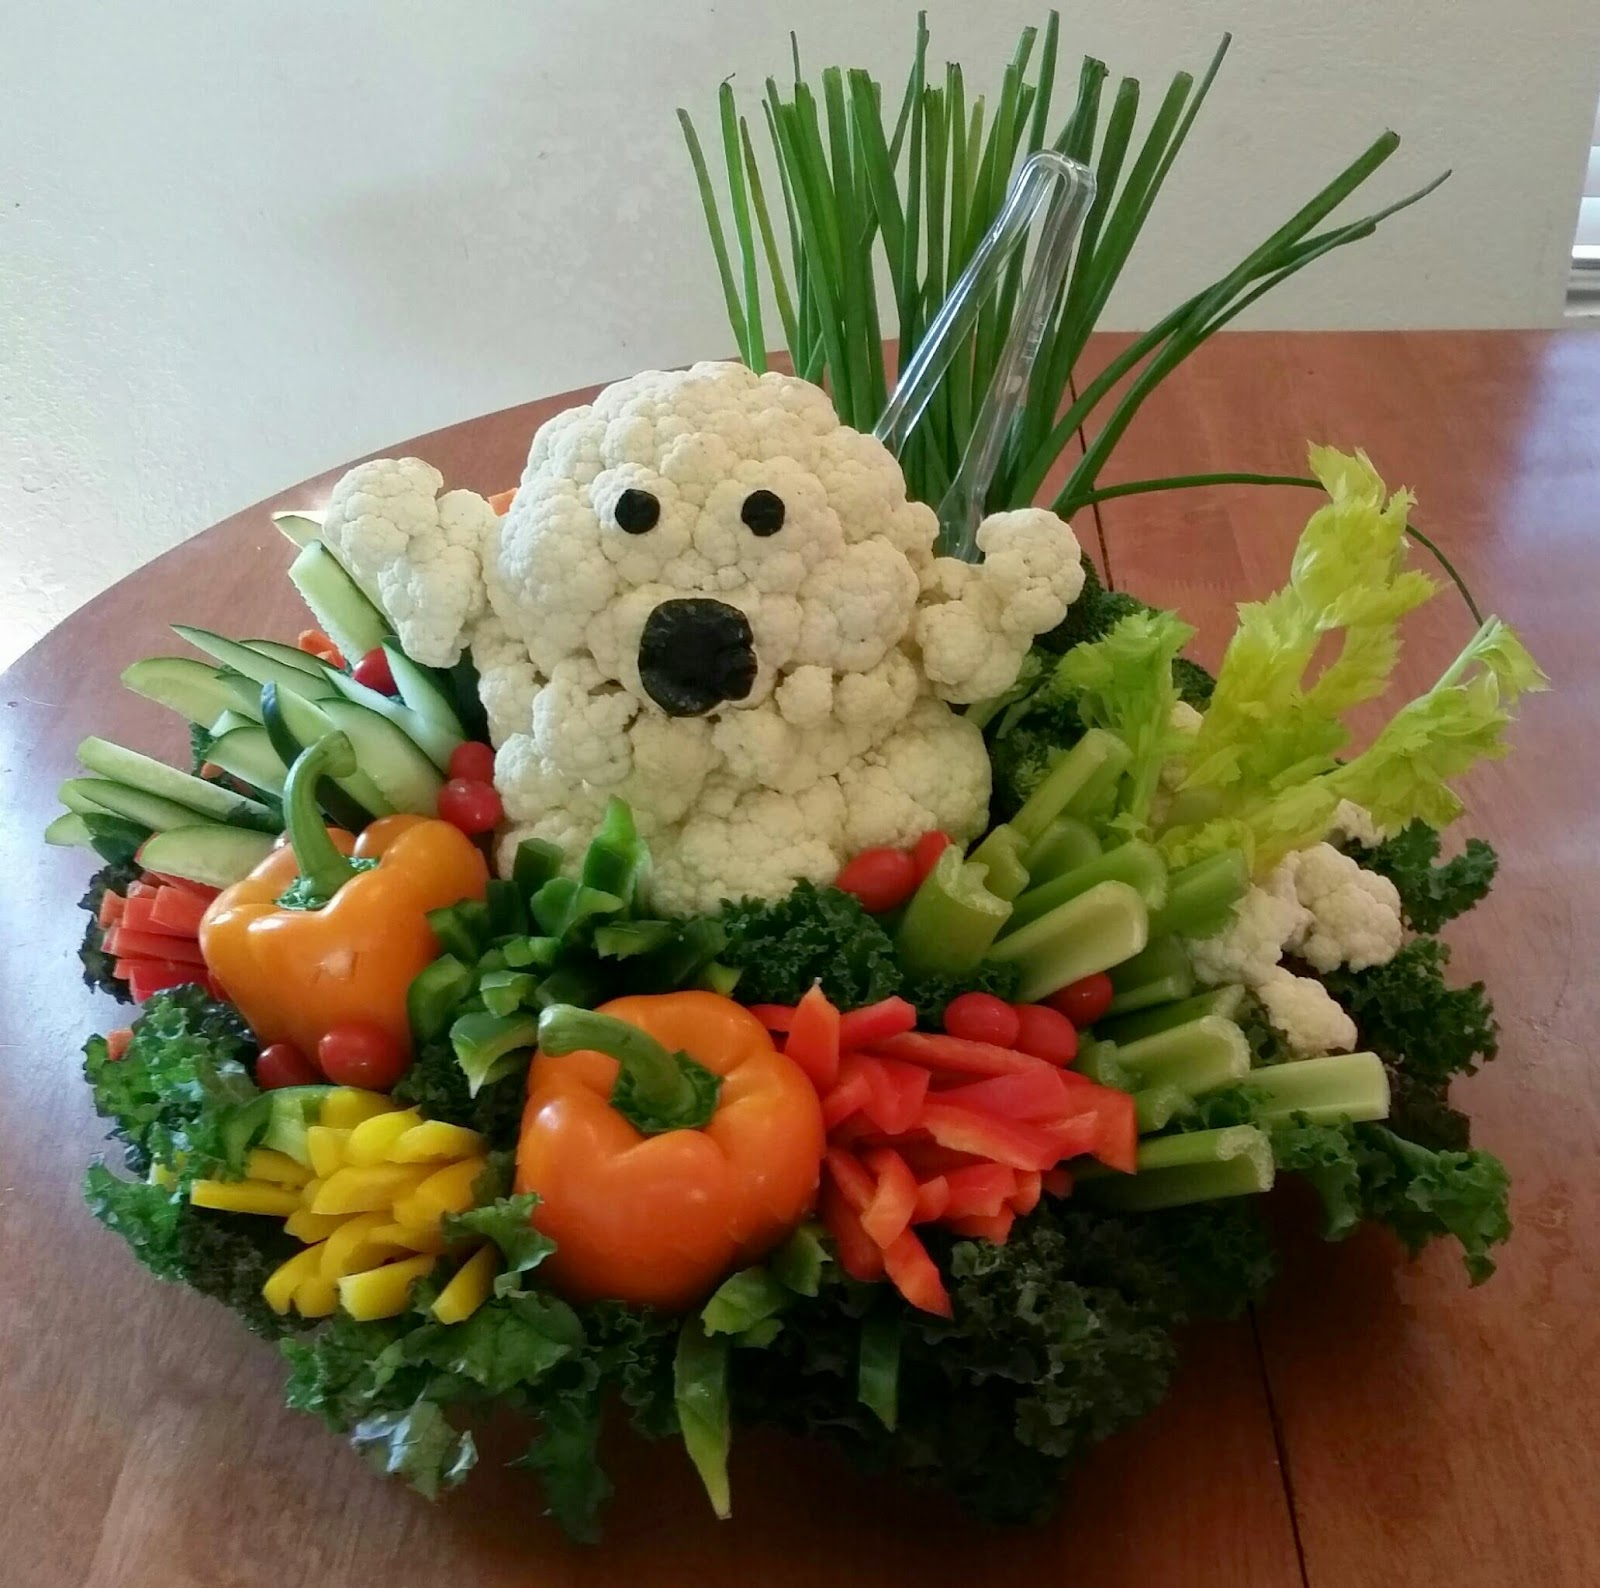 Vegan Pregnancy, Vegan Kids Food, Animal